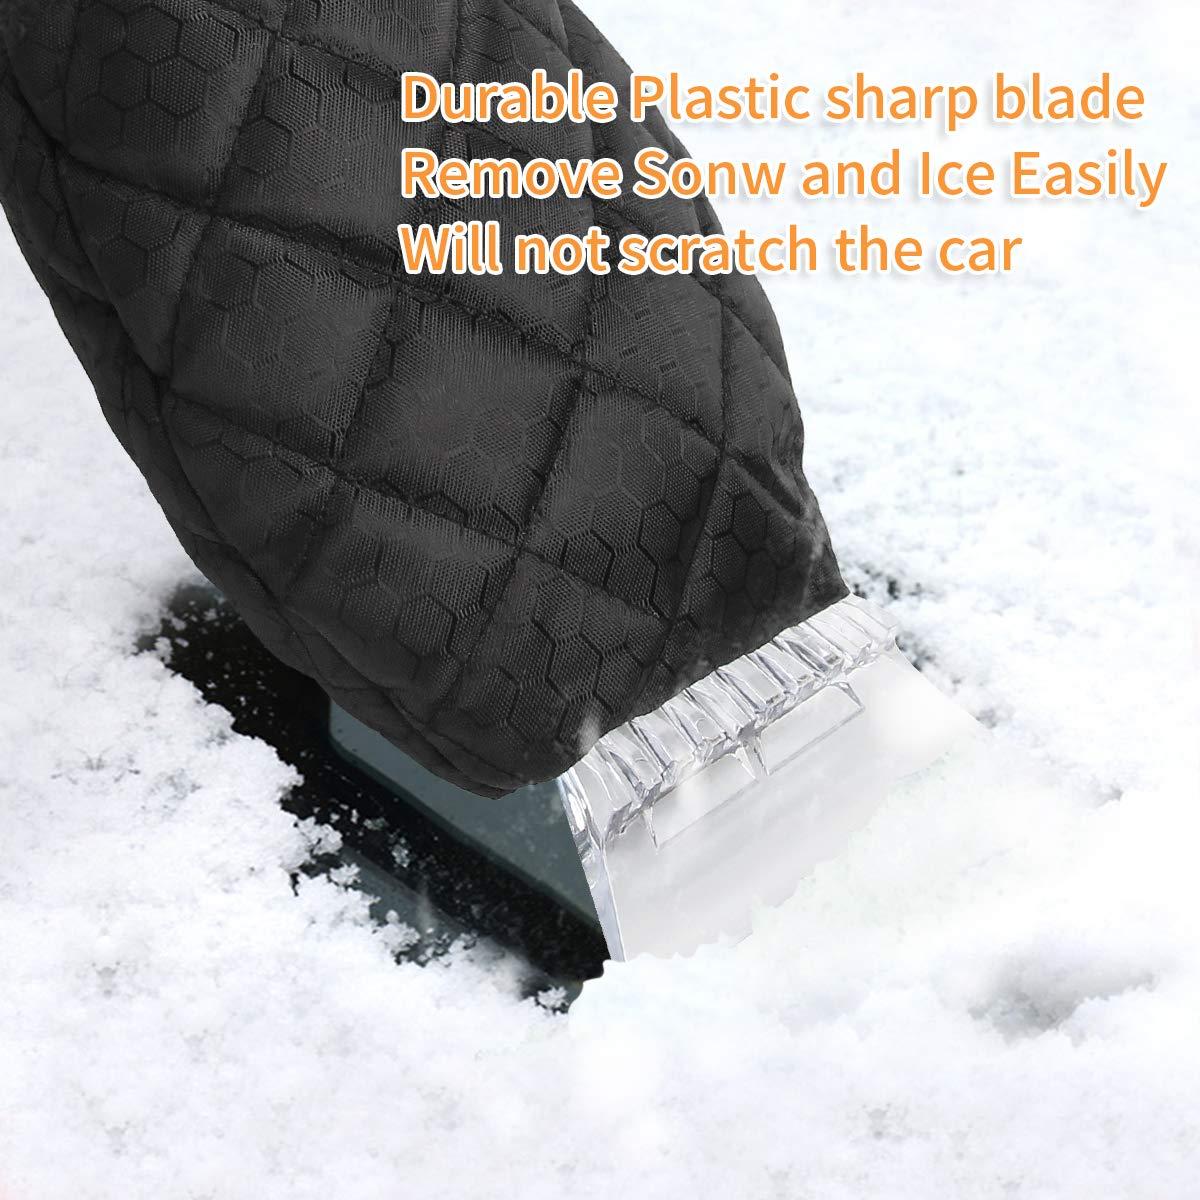 YIBEICO 2 Pack Ice Scraper Black Elastic Wristband Windscreen Ice Scraper Mitts Waterproof Keep Hand Warm Car Windshield Snow Scrapers